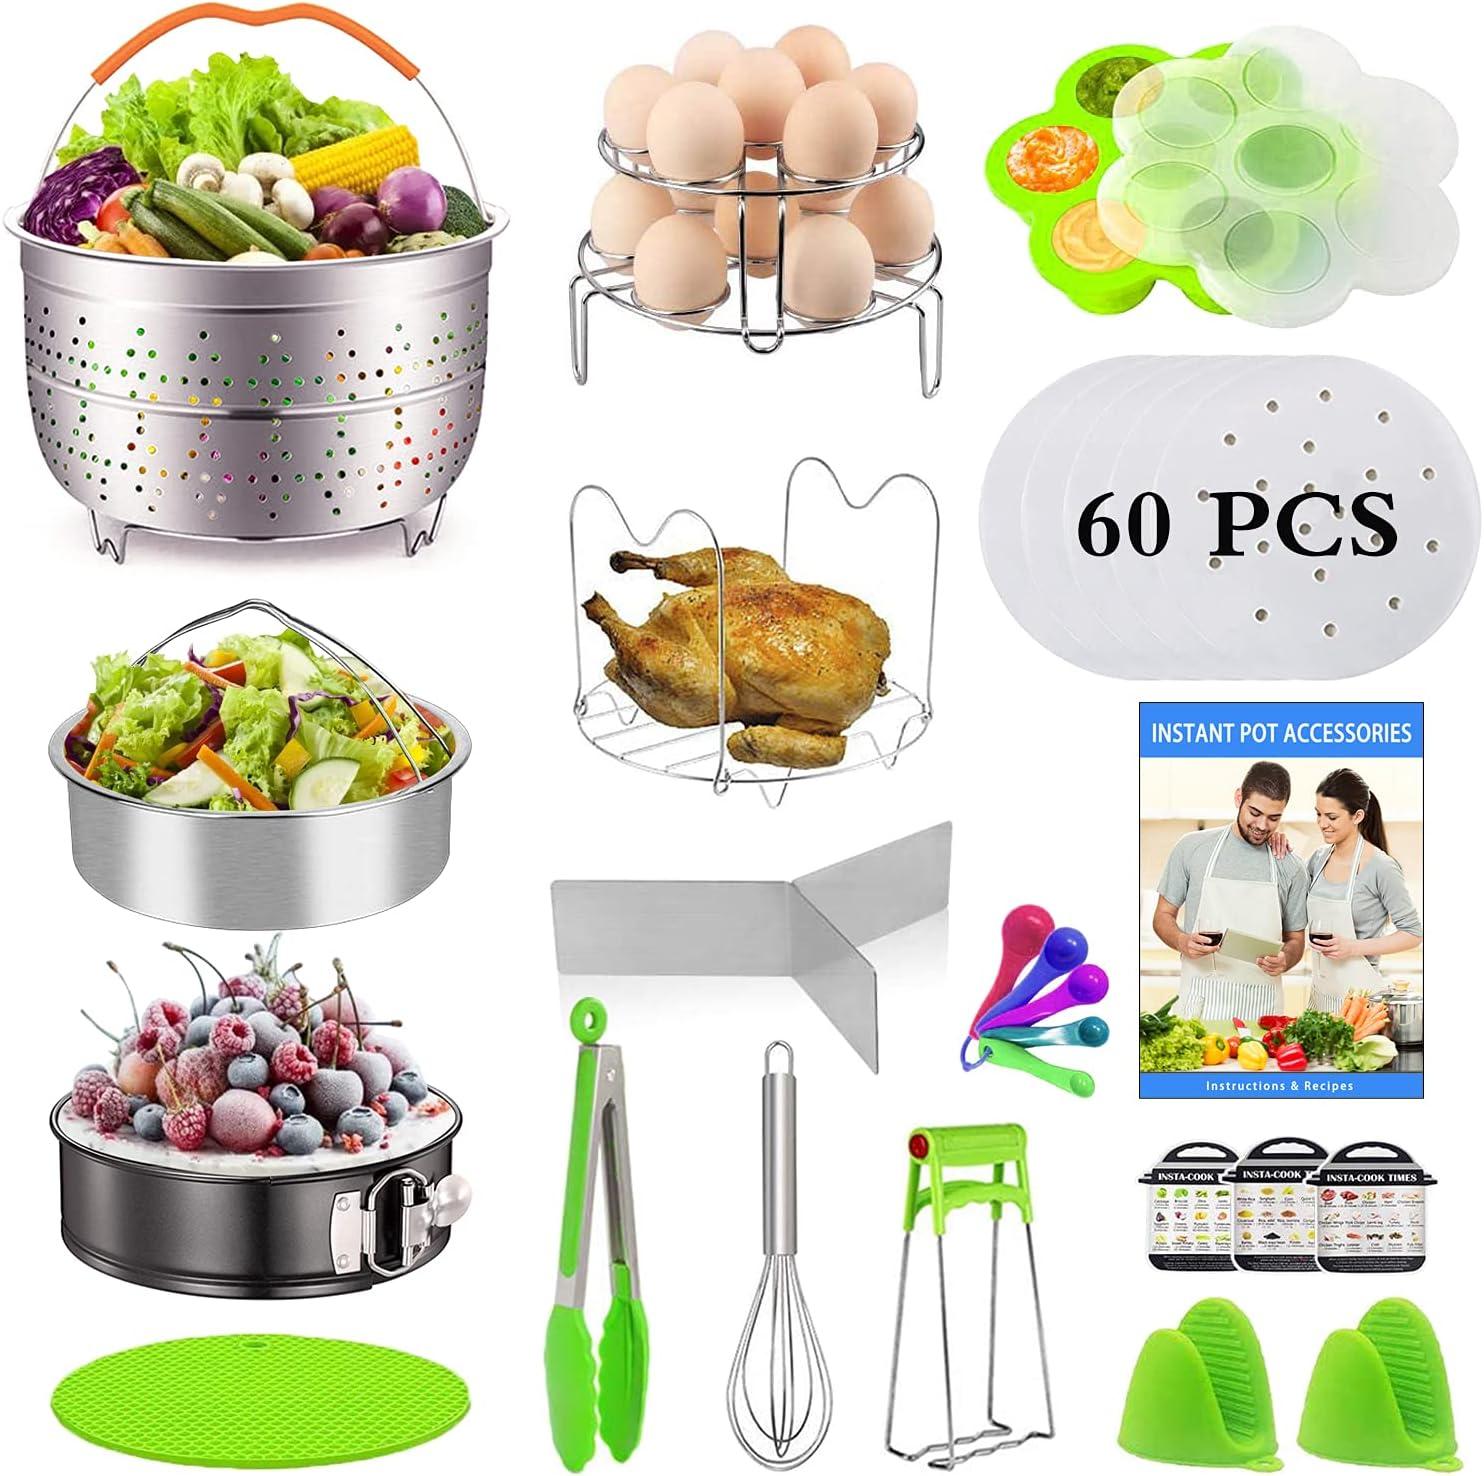 20 PCS Pressure Cooker Accessories Set Compatible with Instant Pot 6,8Qt - Ninja Foodi 8qt, 2 Steamer Baskets, Springform Pan, Stackable Egg Steamer Rack, Egg Beater, Instruction & Recipes Book